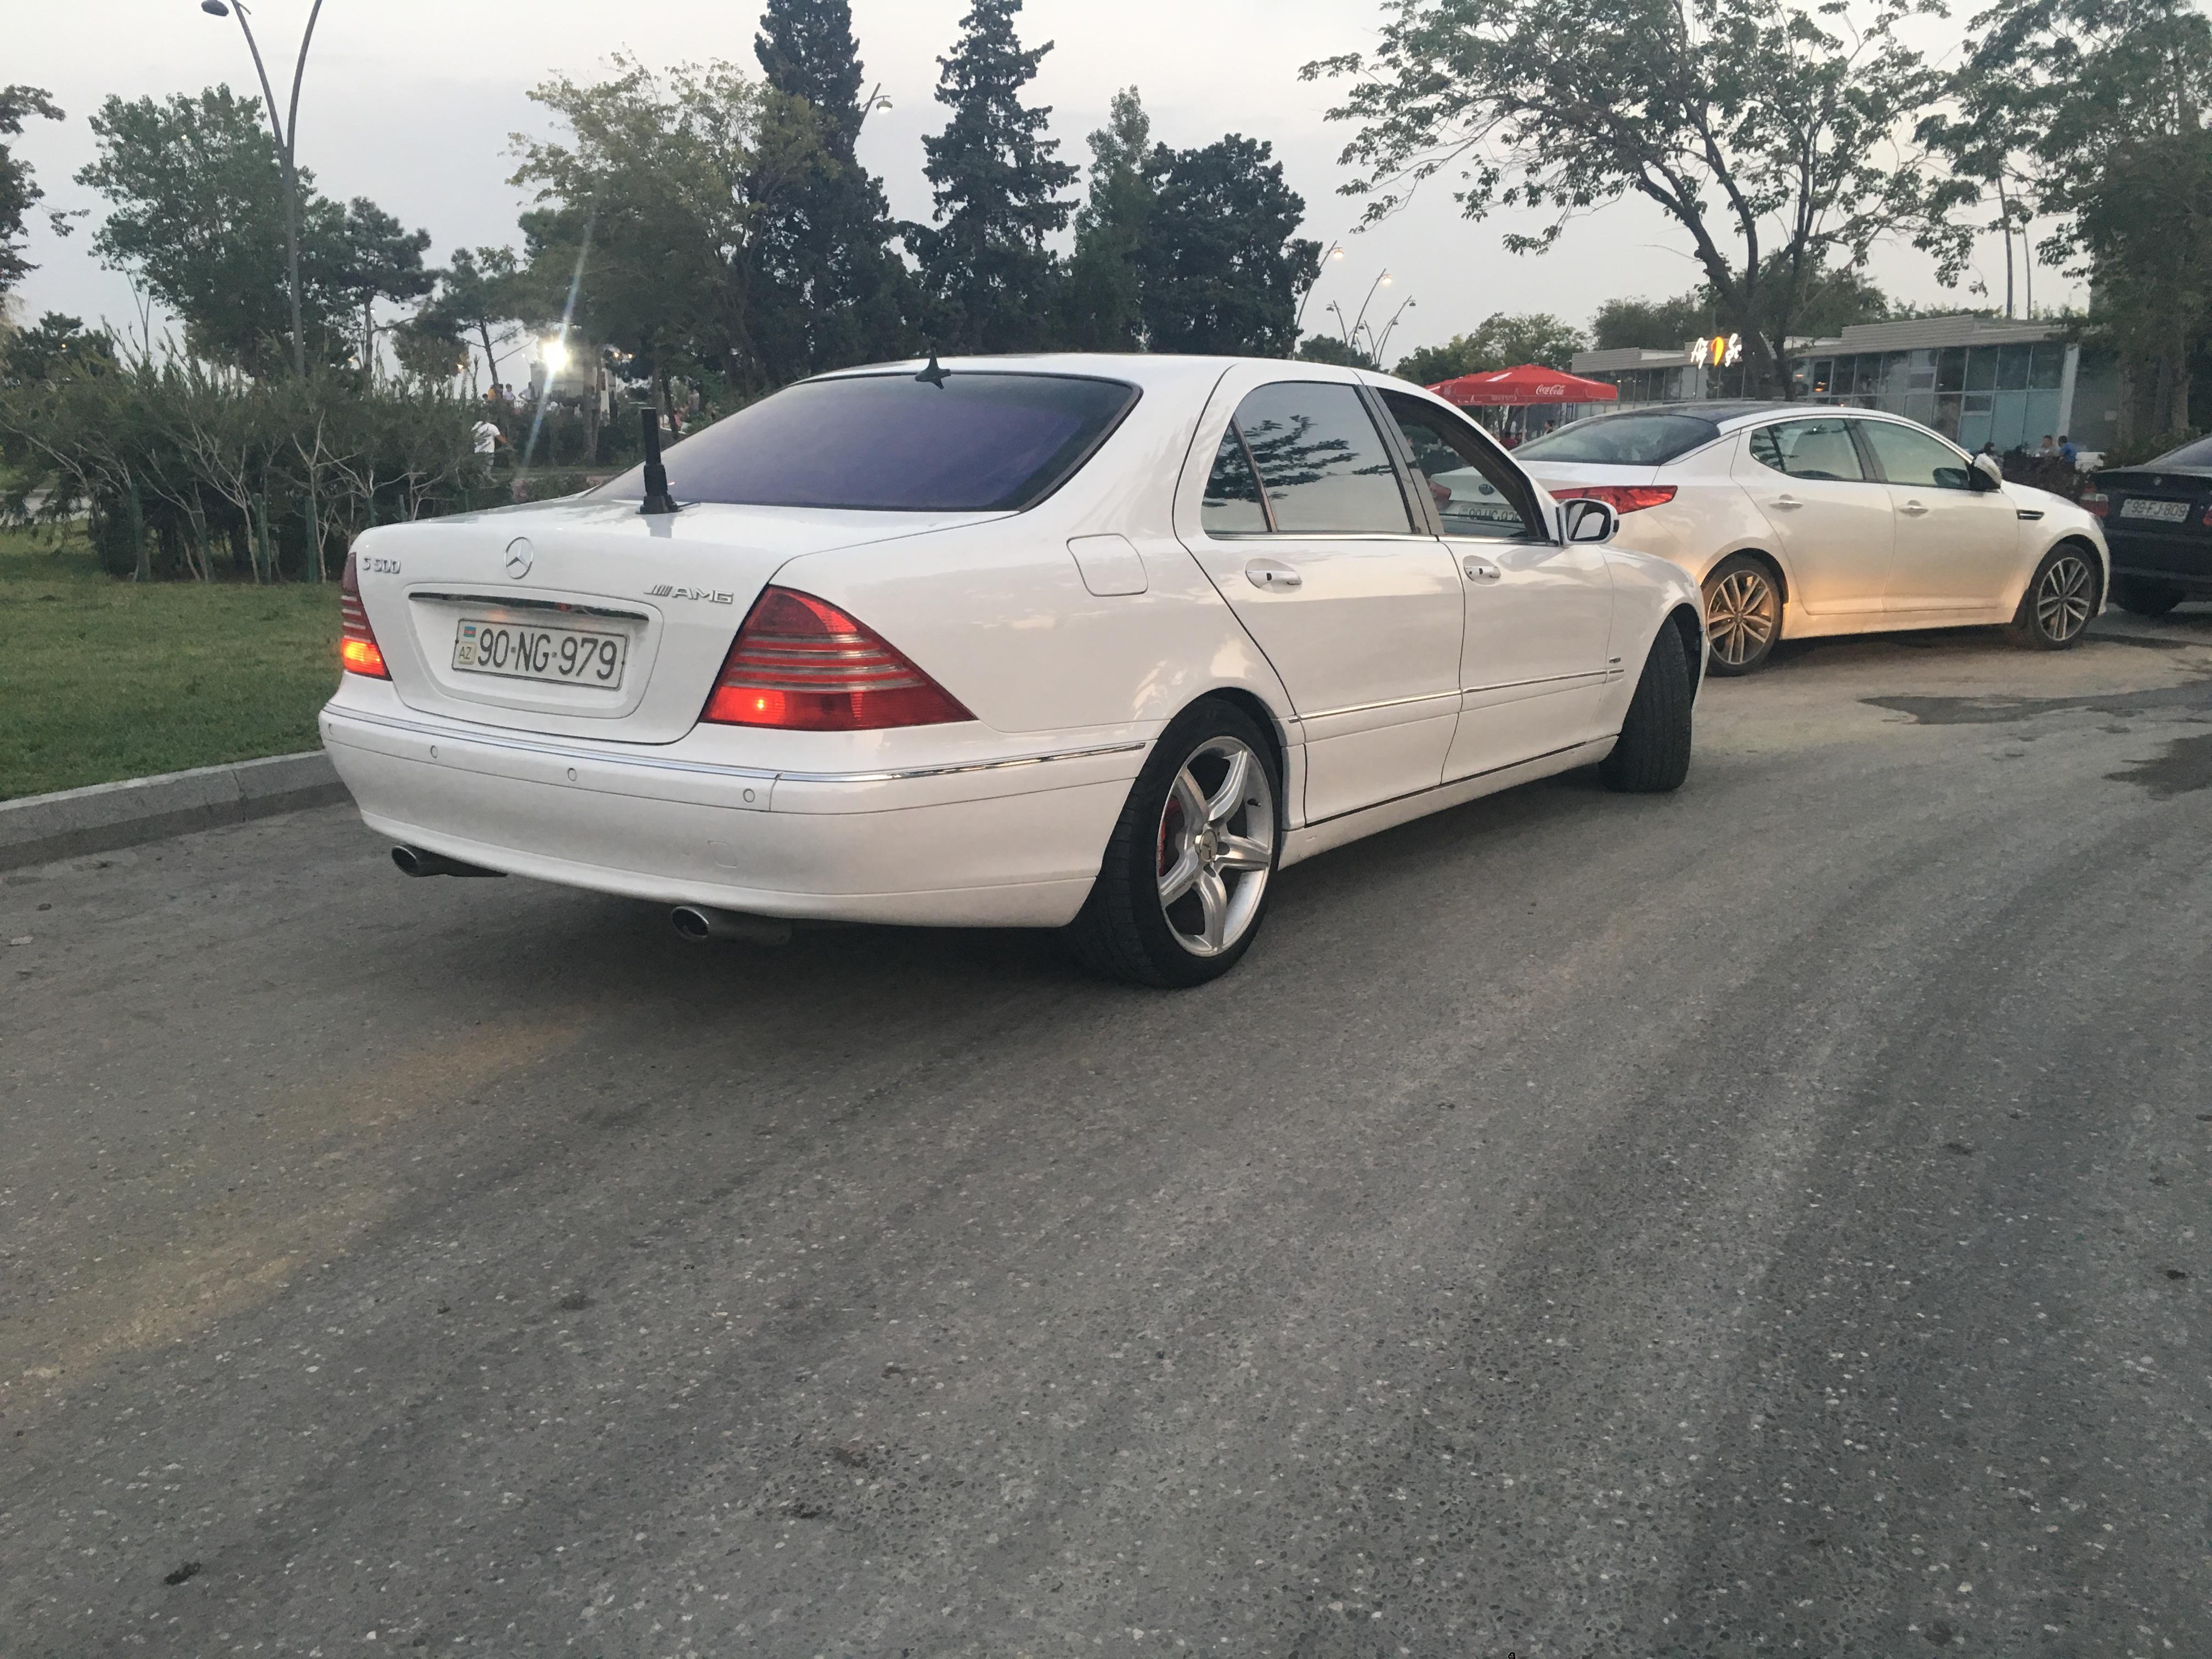 Mercedes-Benz S 320 3.2(lt) 2000 Second hand  $7800